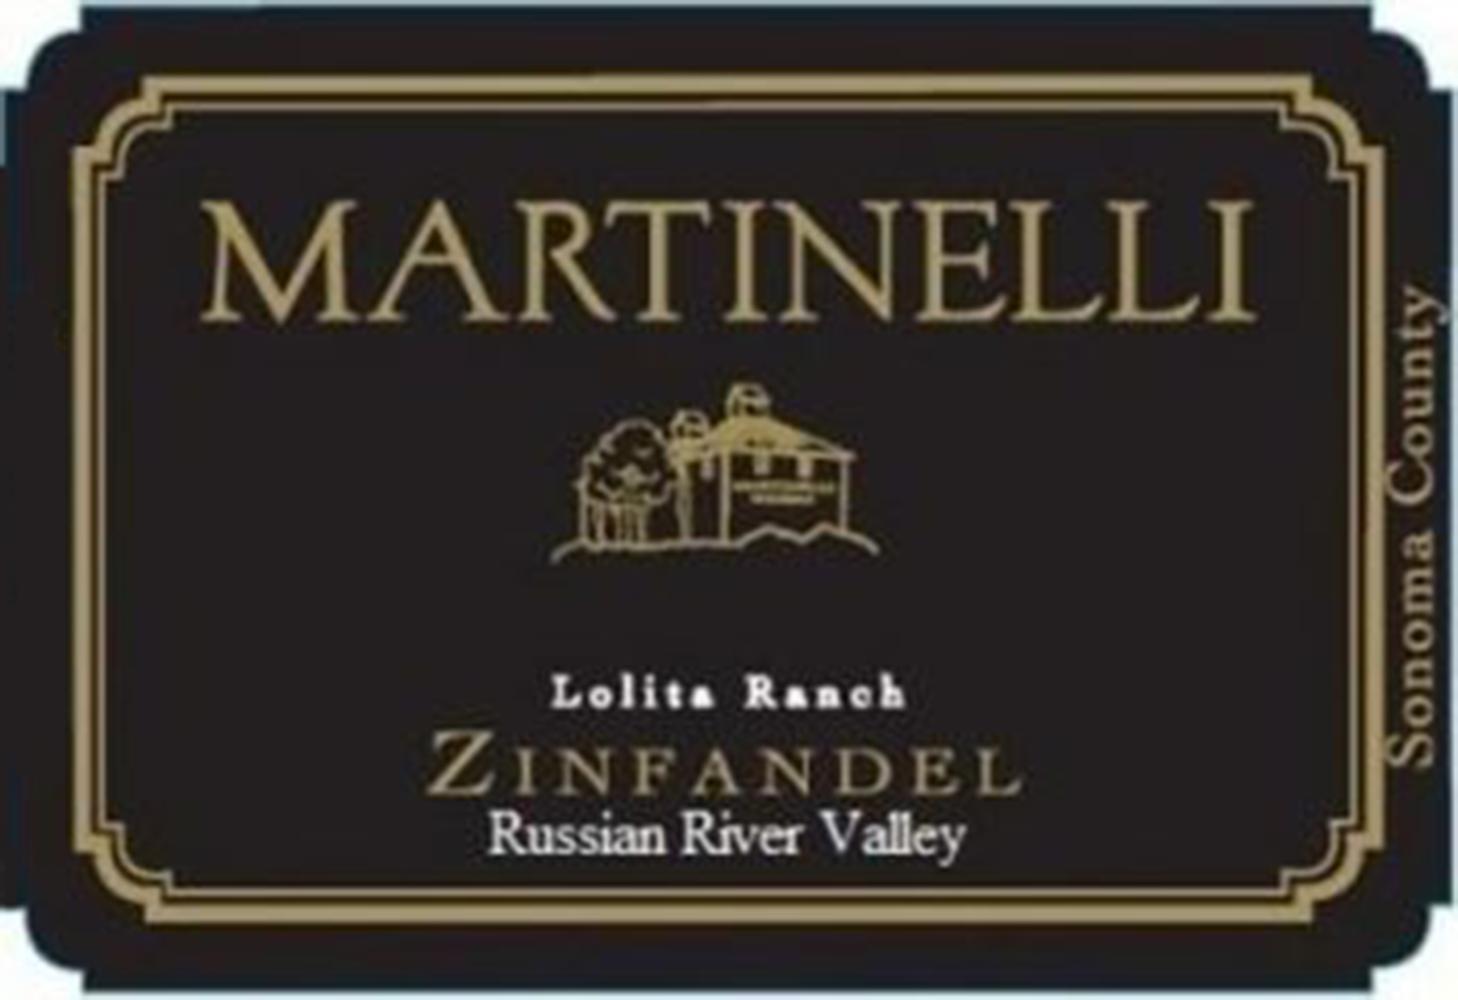 Martinelli Lolita Ranch Zinfandel 2018